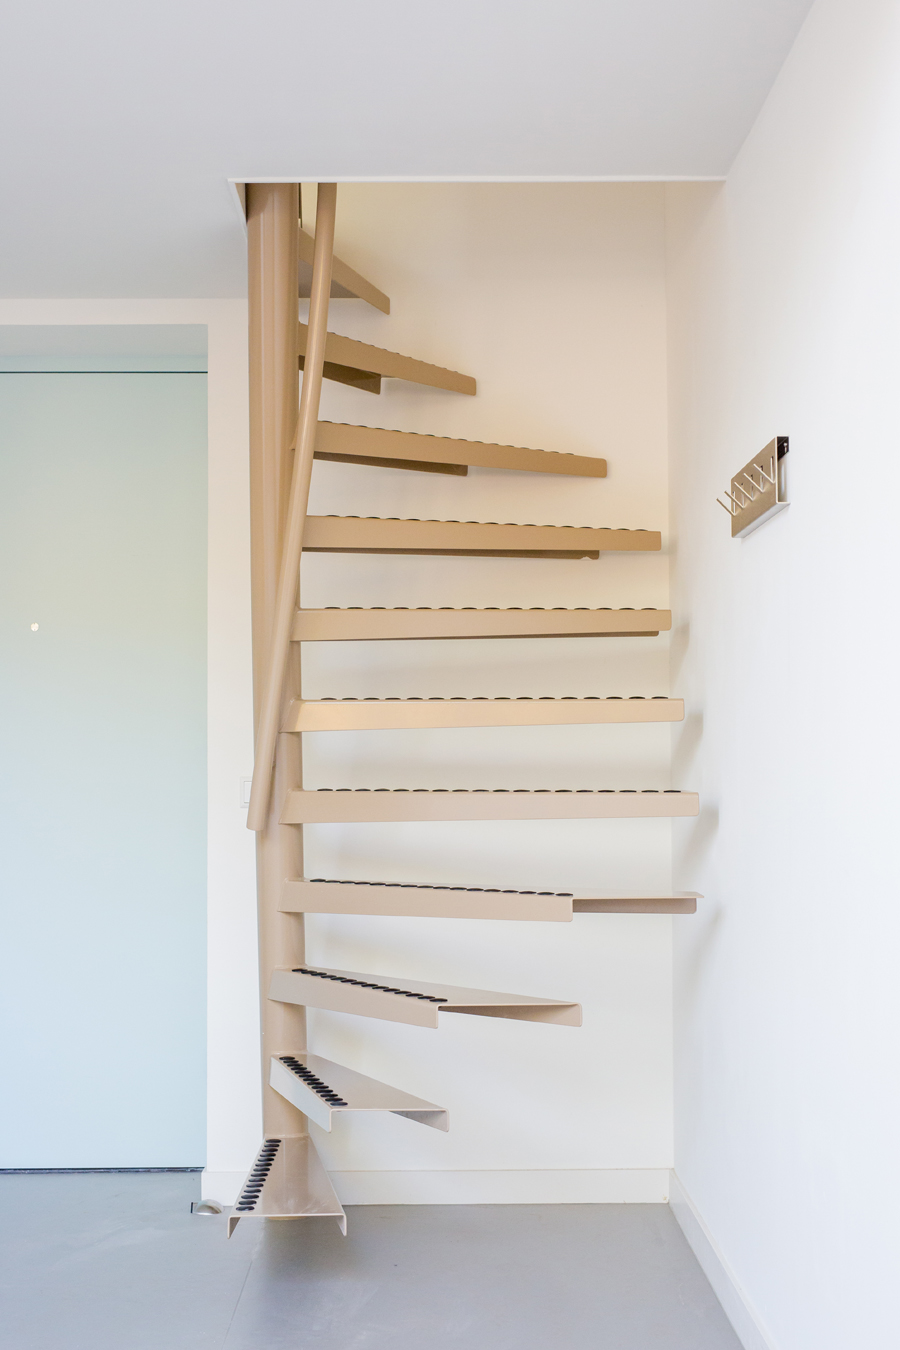 Una soluci n perfecta para la vida en espacios peque os for Escaleras modernas para espacios pequenos